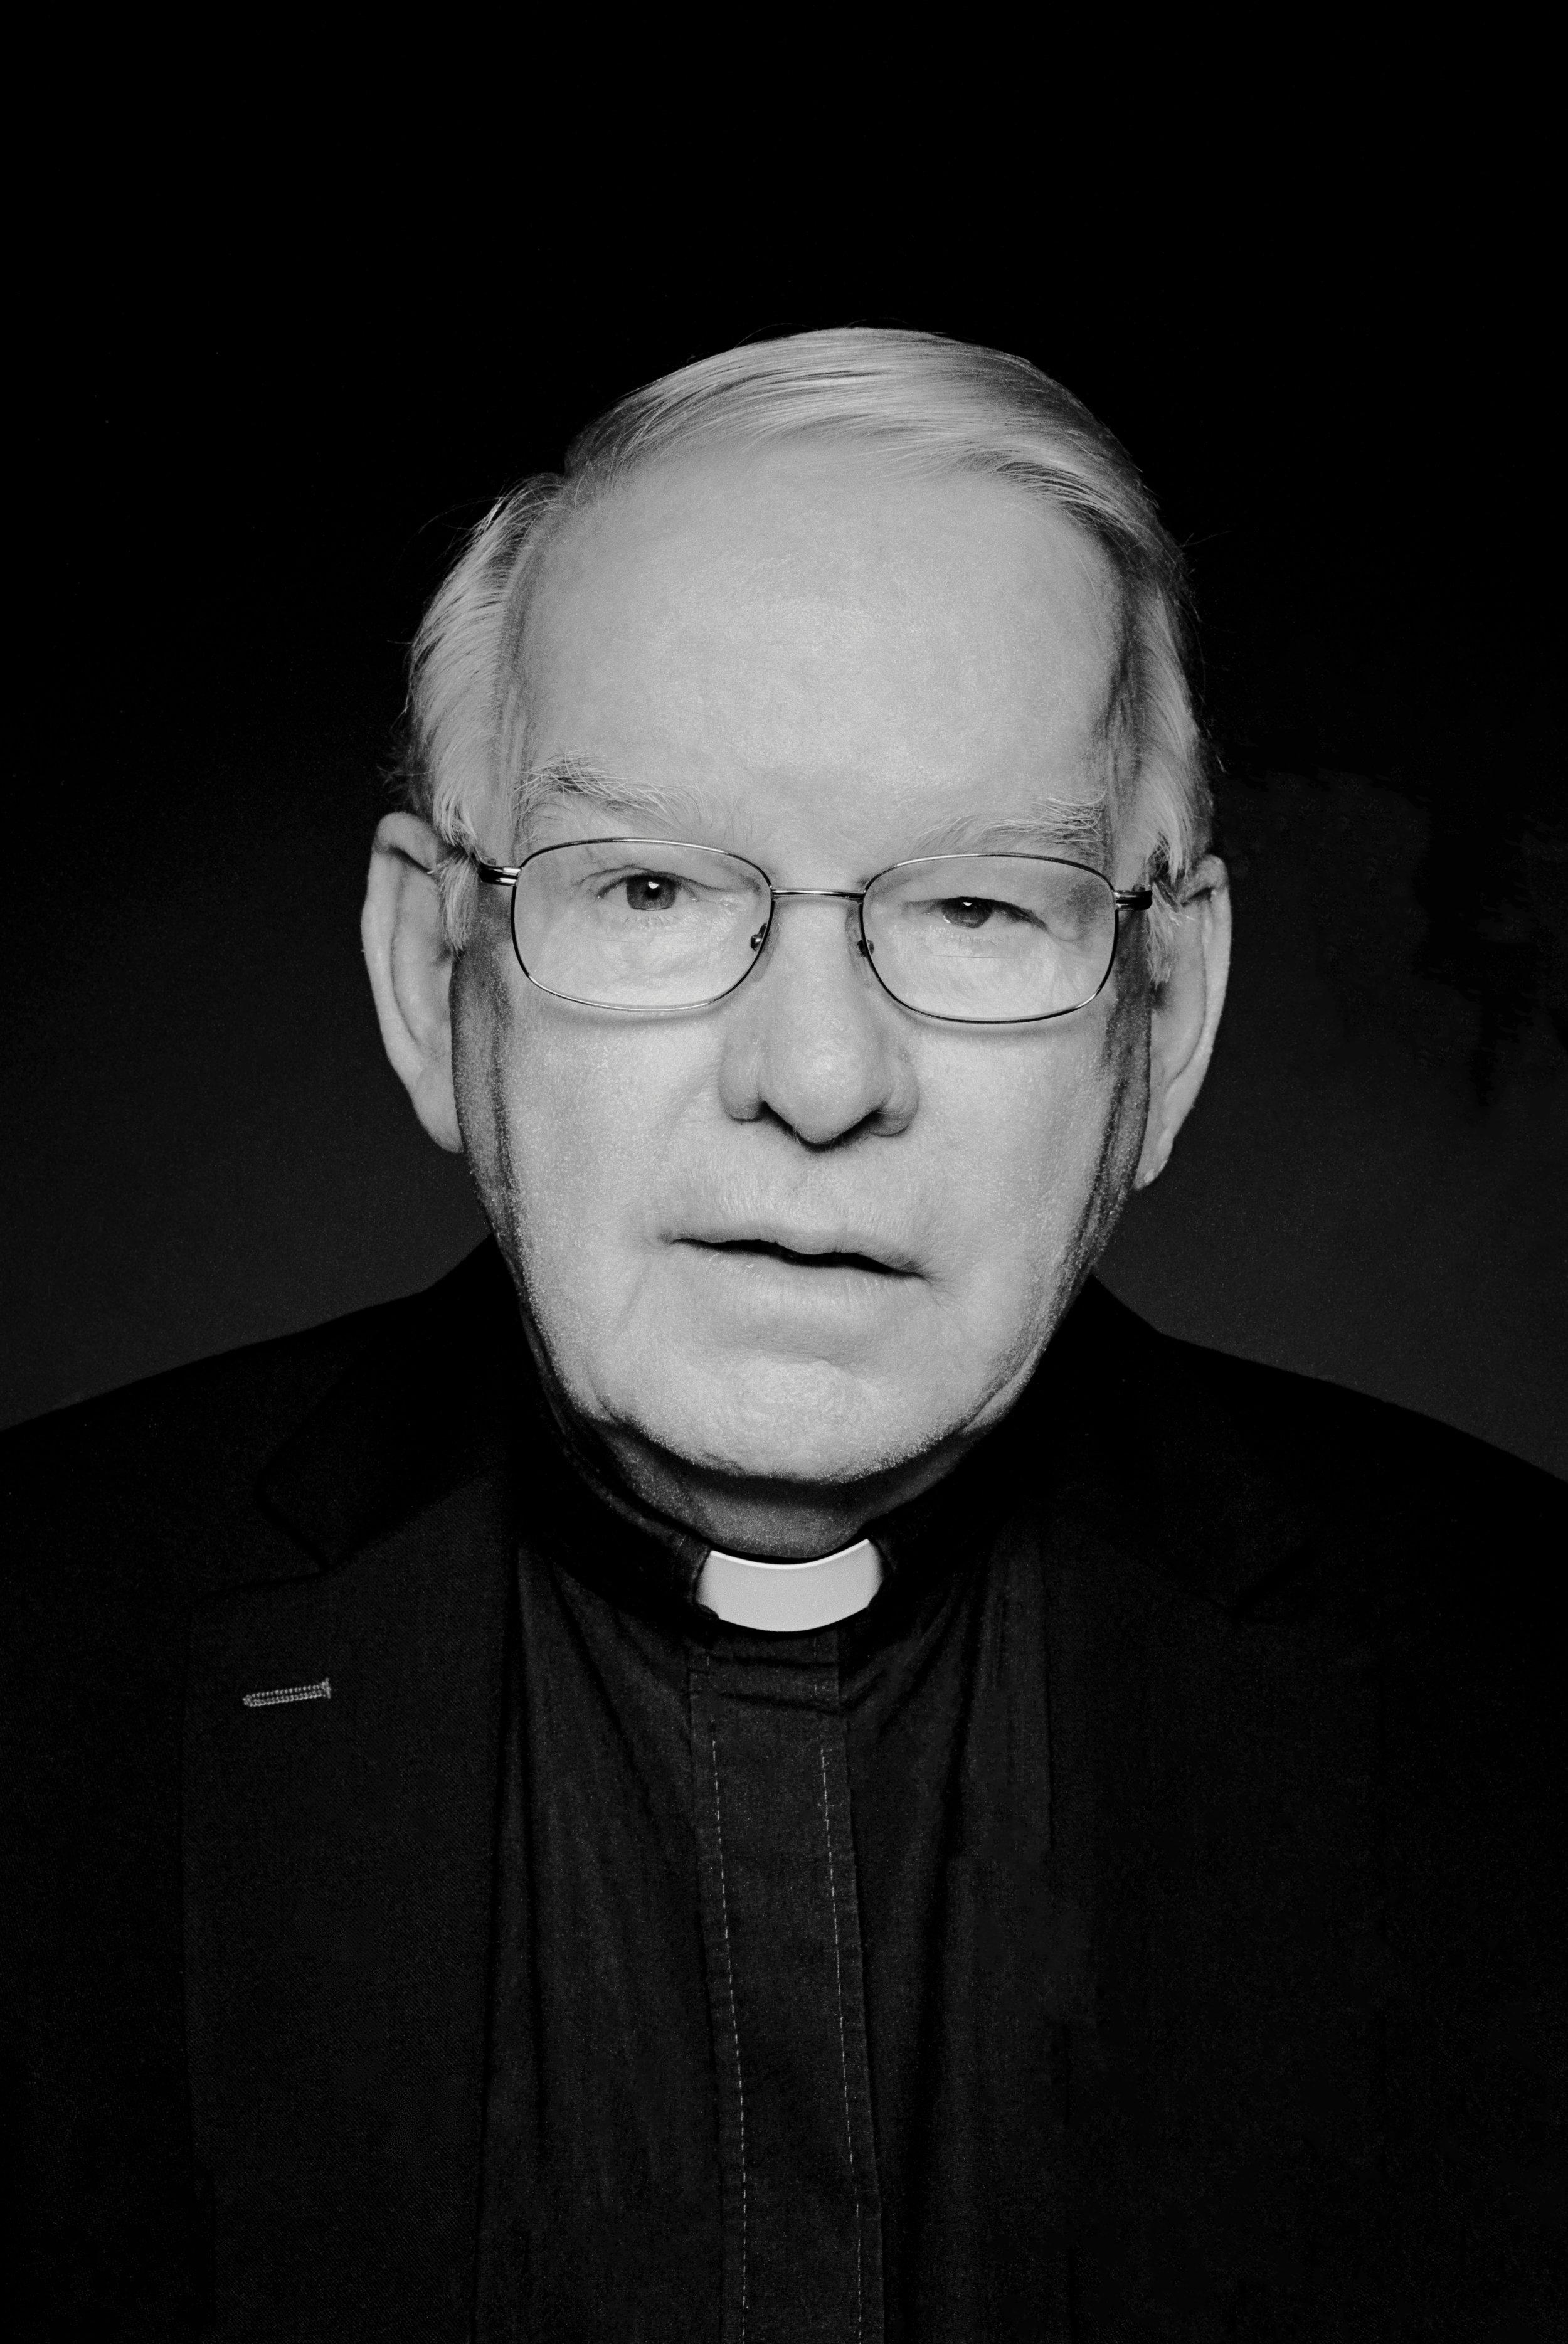 Inside The Film: Fr. Buckley, S.J.